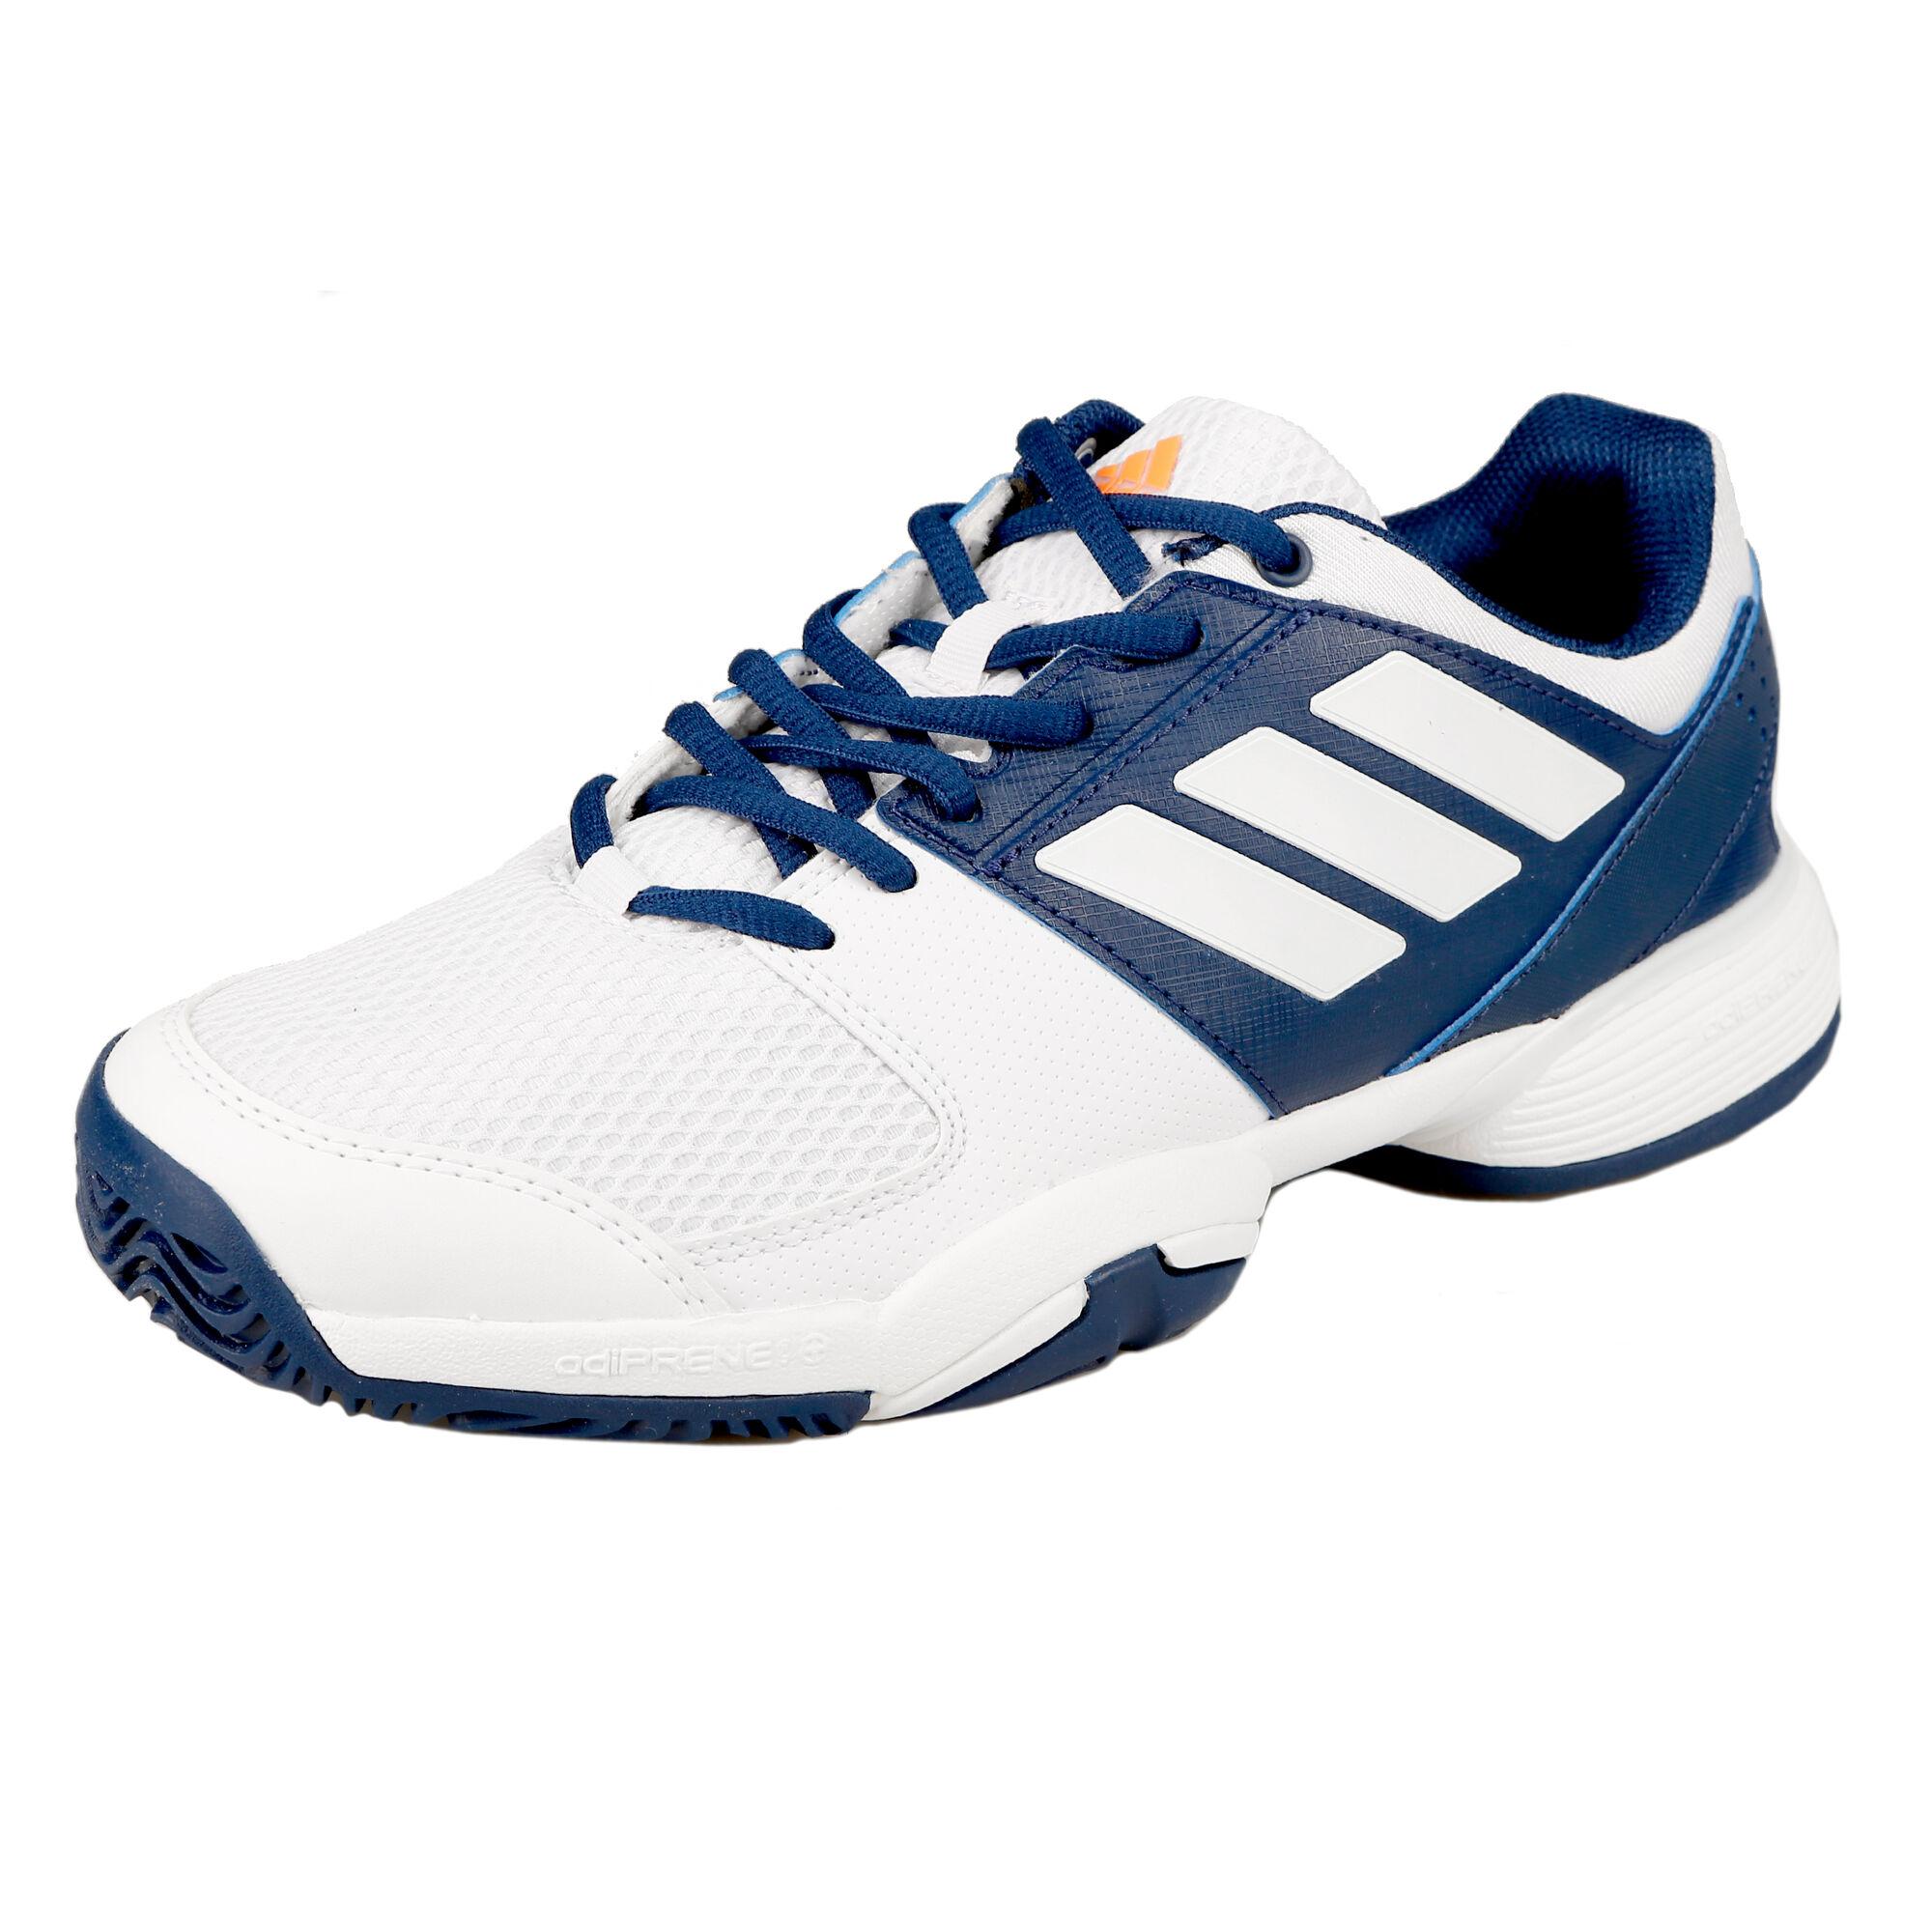 1f56a232 adidas Barricade Club Allcourt-sko Børn - Hvid, Mørkeblå køb online ...